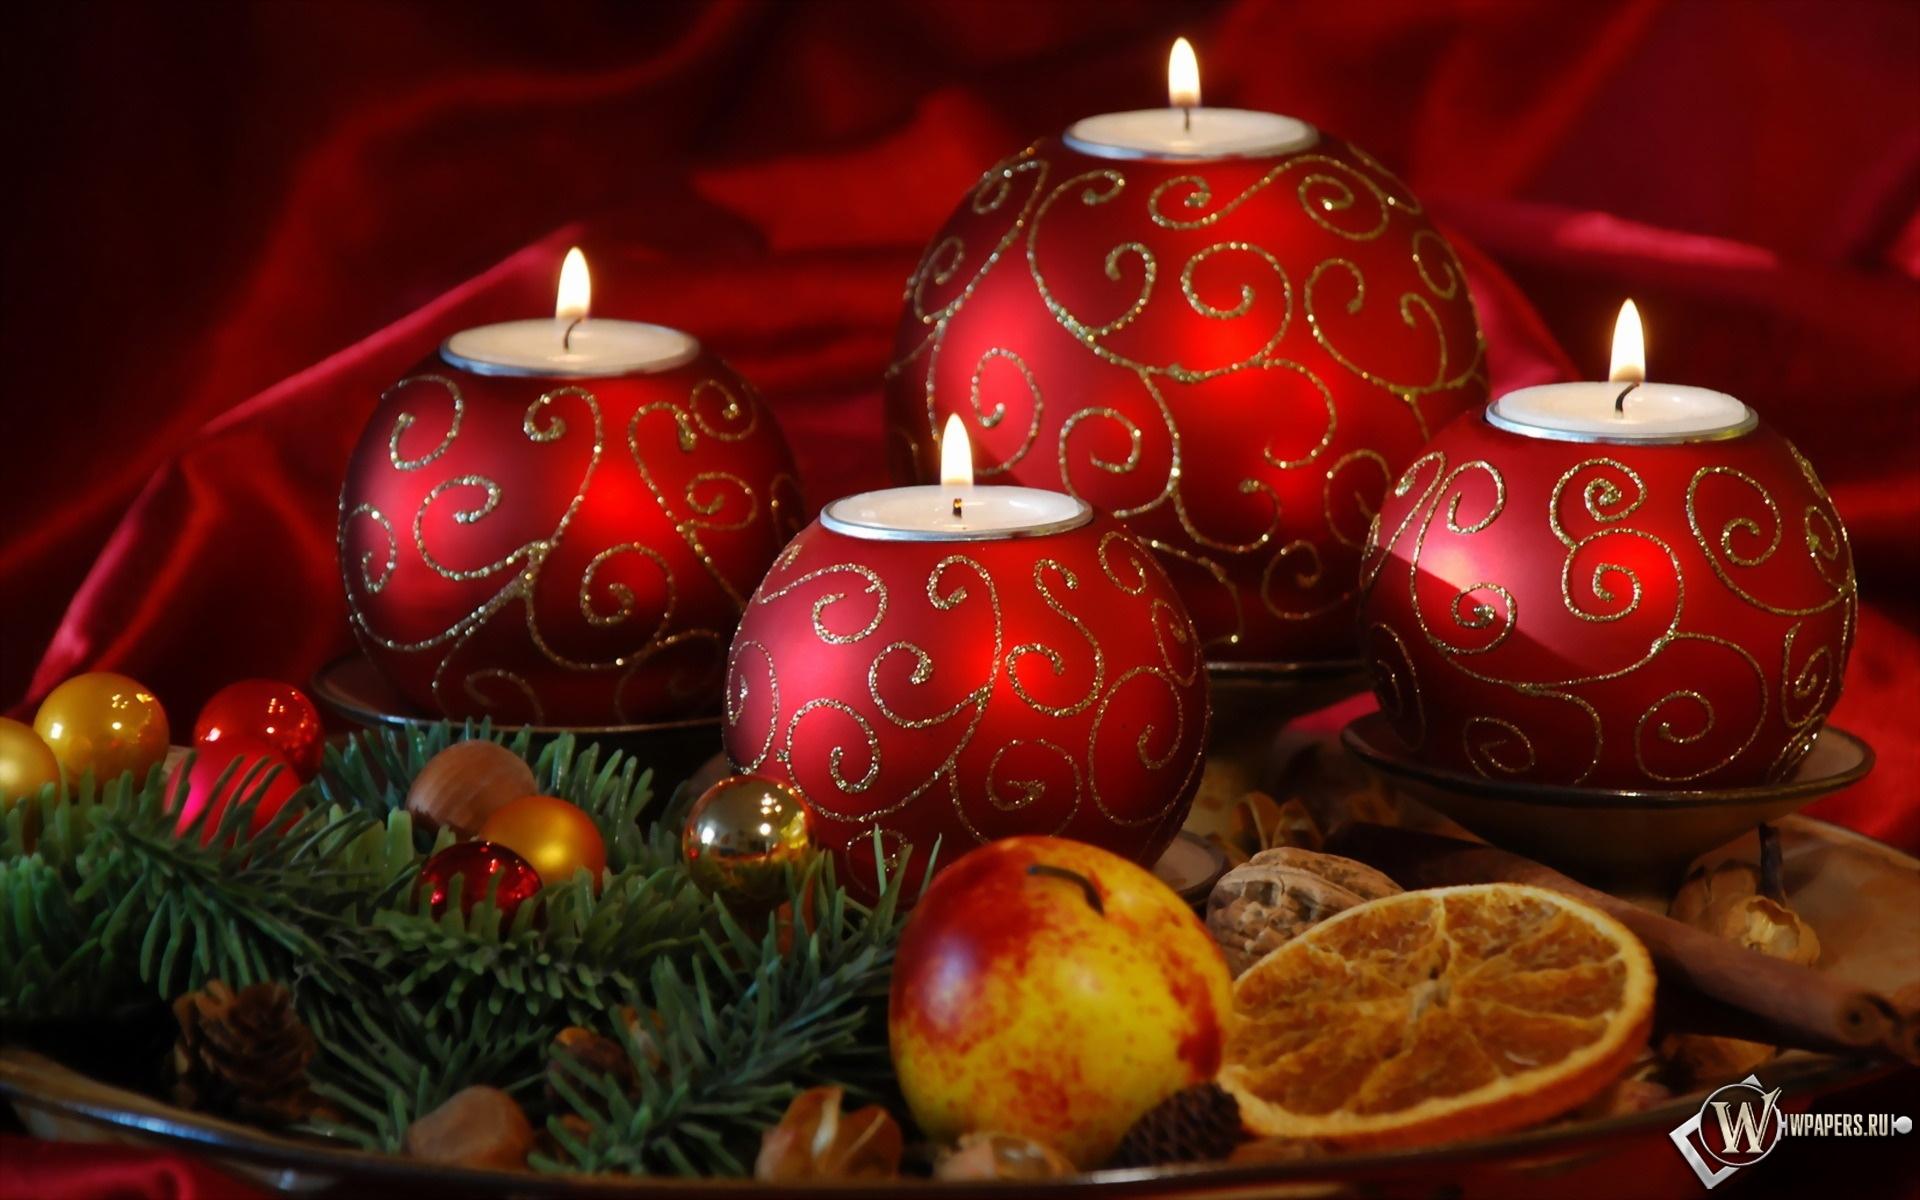 Новогодние свечи 1920x1200